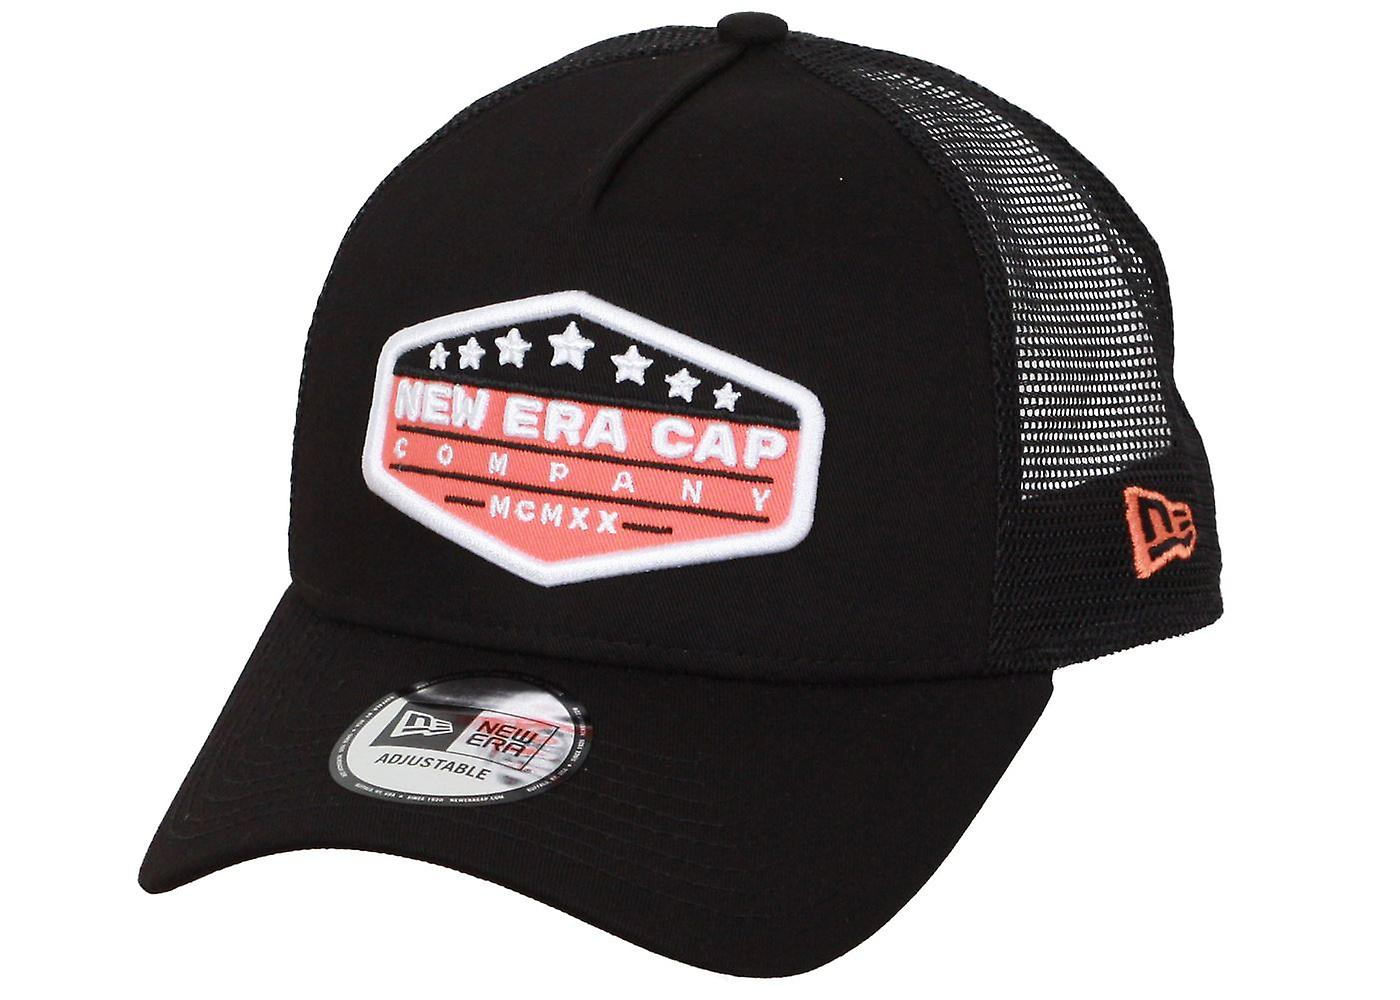 New Era Patch Trucker Cap ~ New Era black